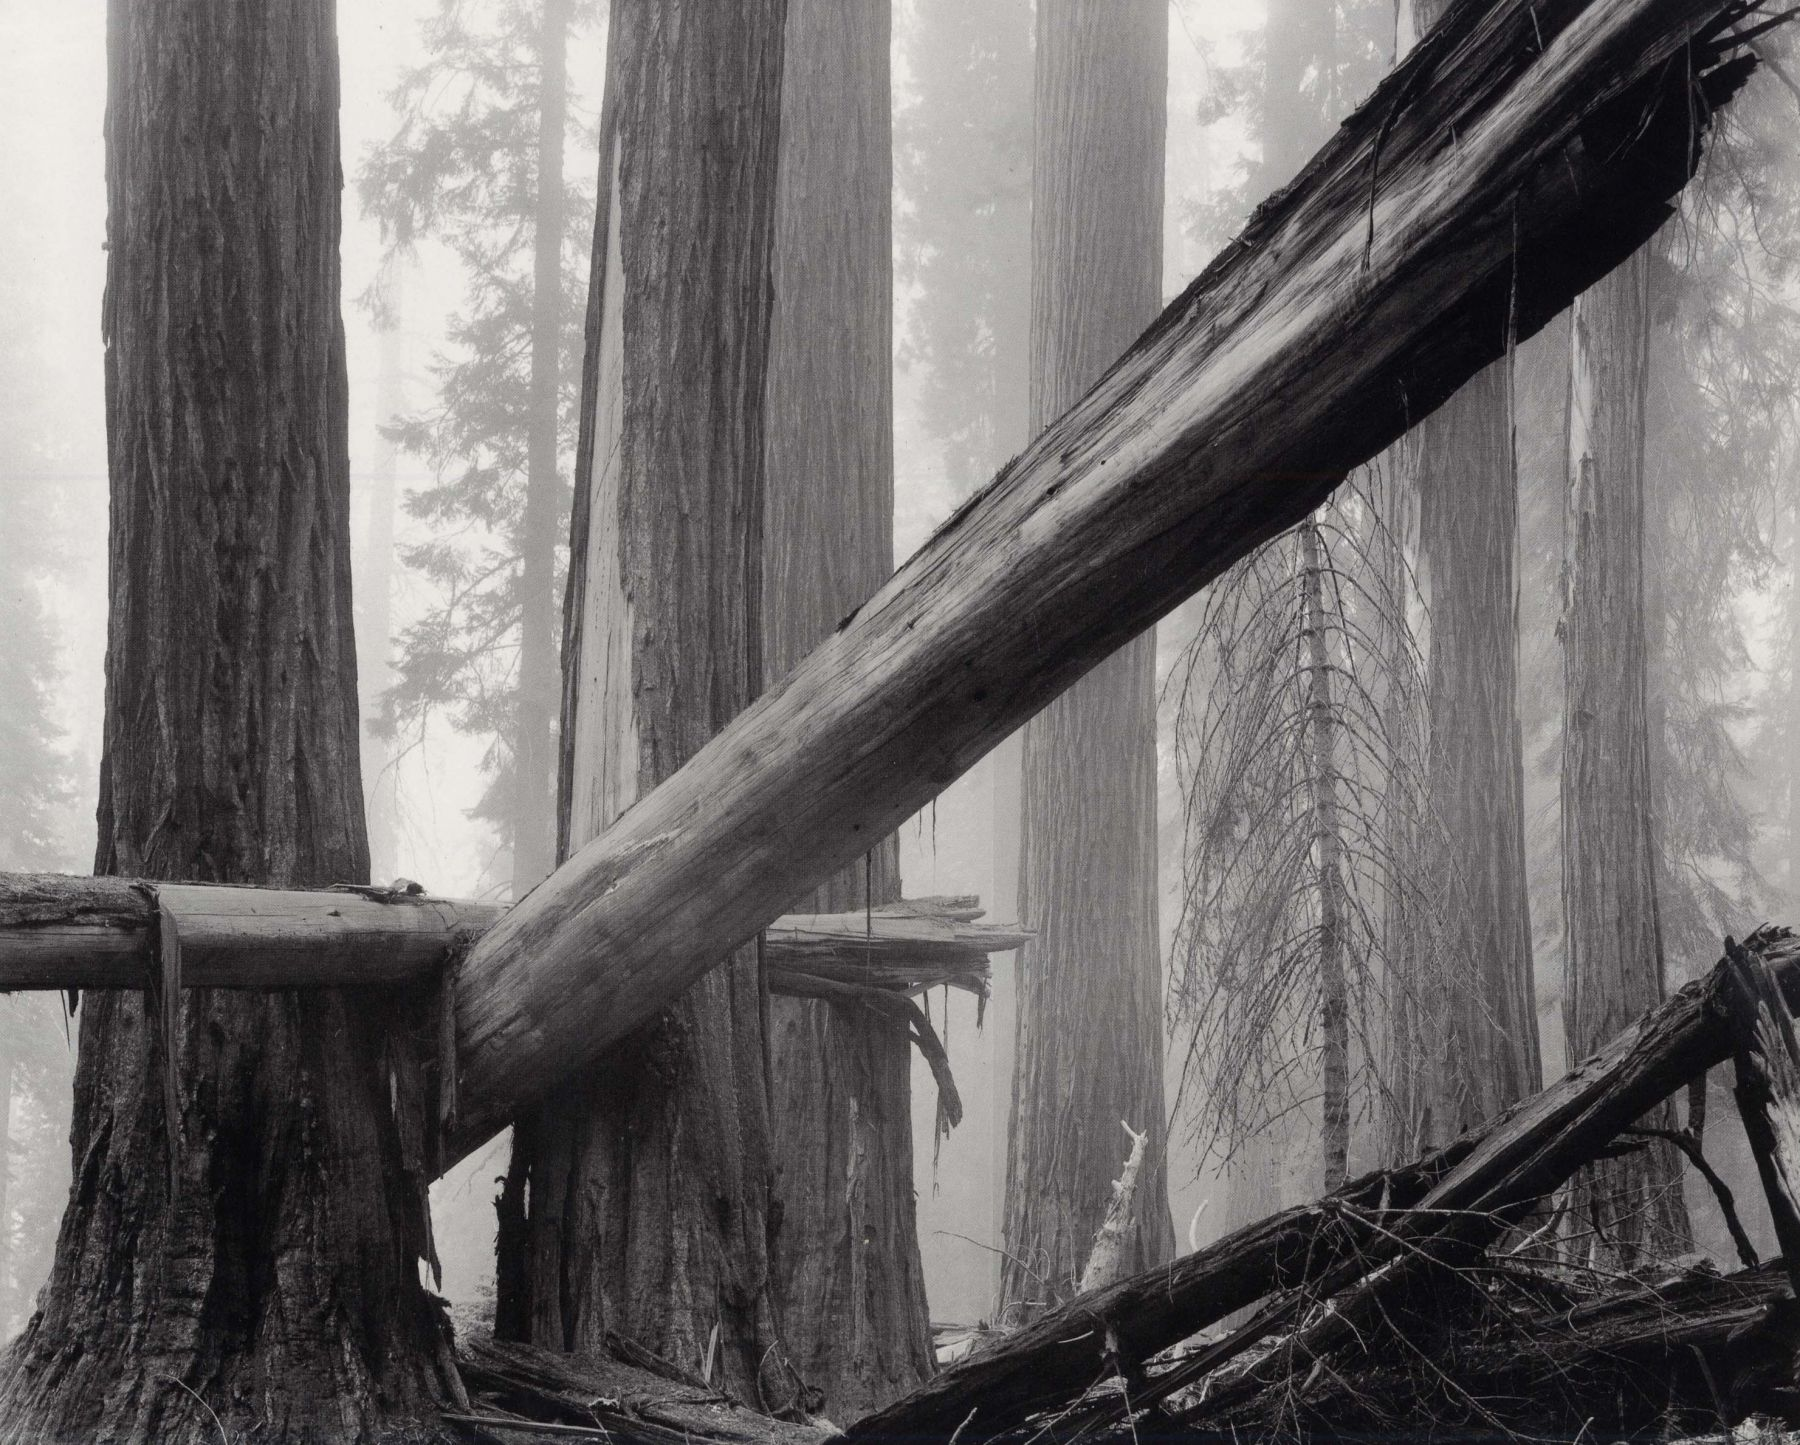 Fallen Sequoias, 1977, 22 x 28 Inches, Silver Gelatin Photograph